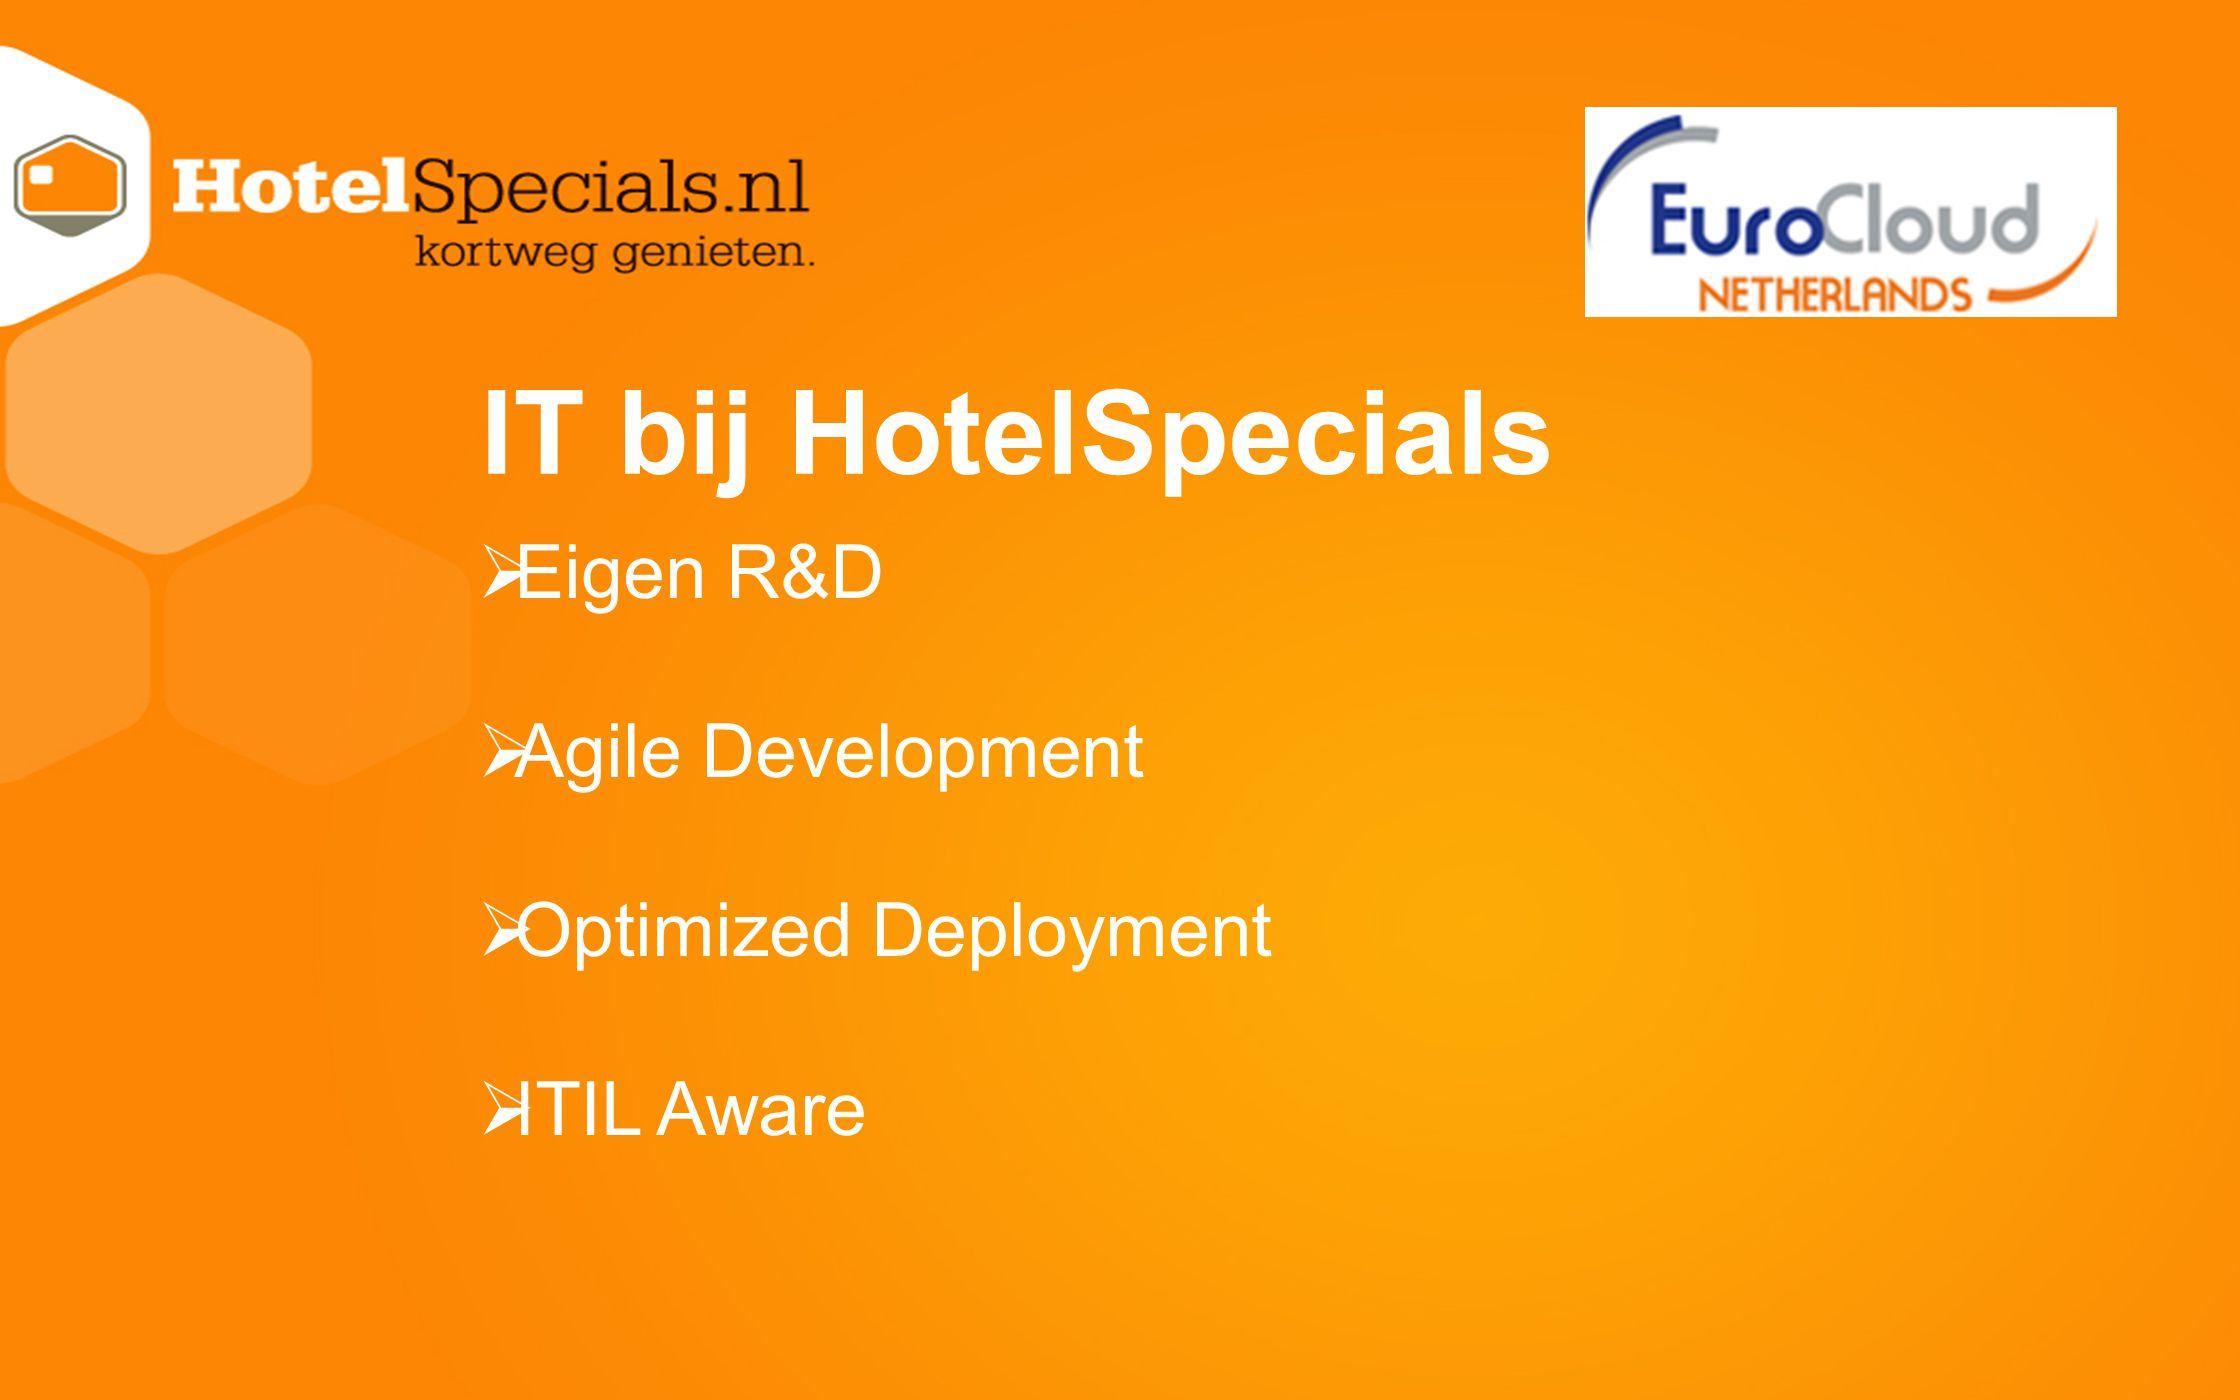 IT bij HotelSpecials  Eigen R&D  Agile Development  Optimized Deployment  ITIL Aware